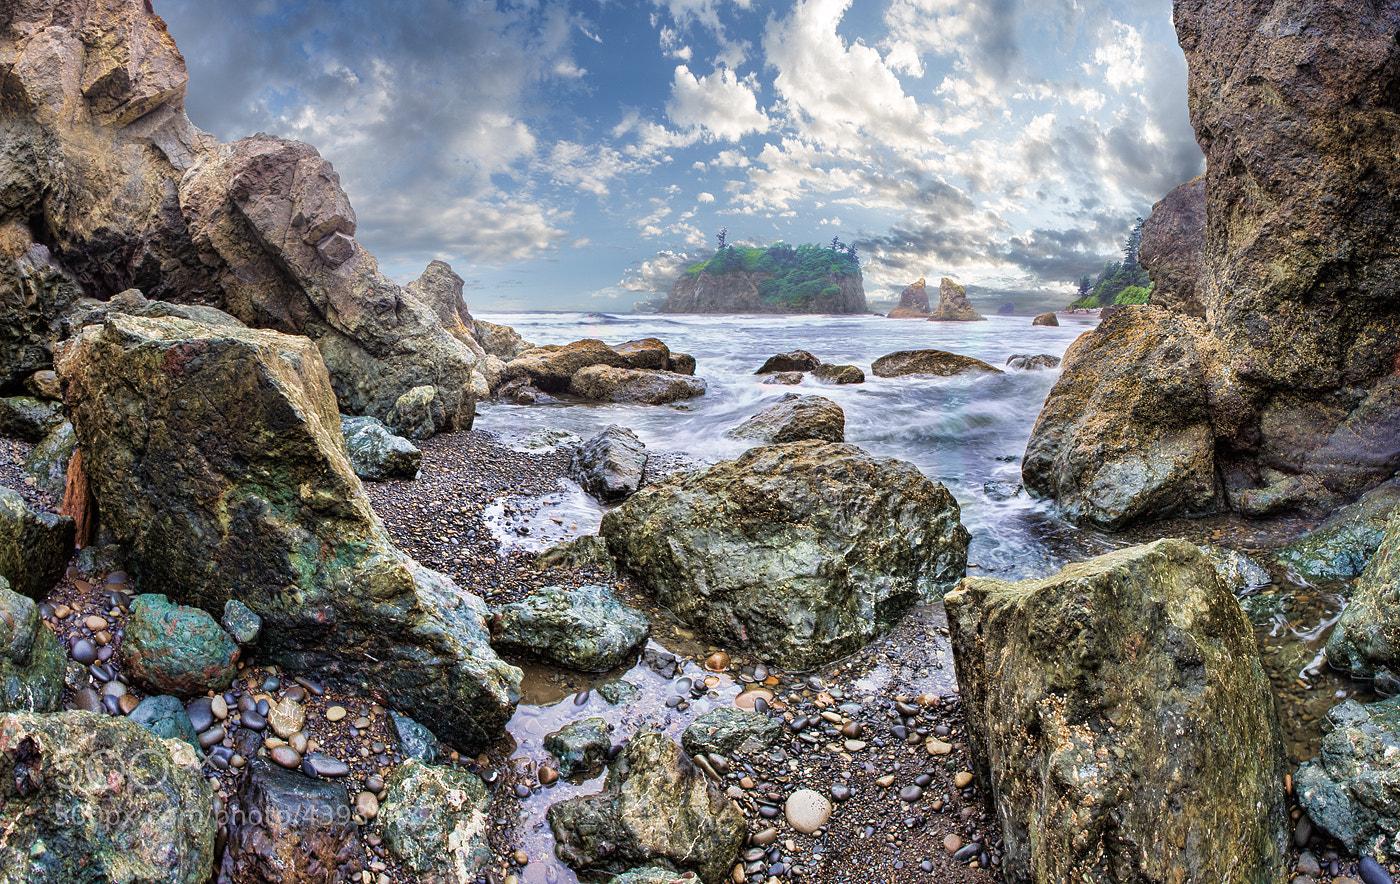 Photograph Pacific Coast N2 by Alex Gubski on 500px